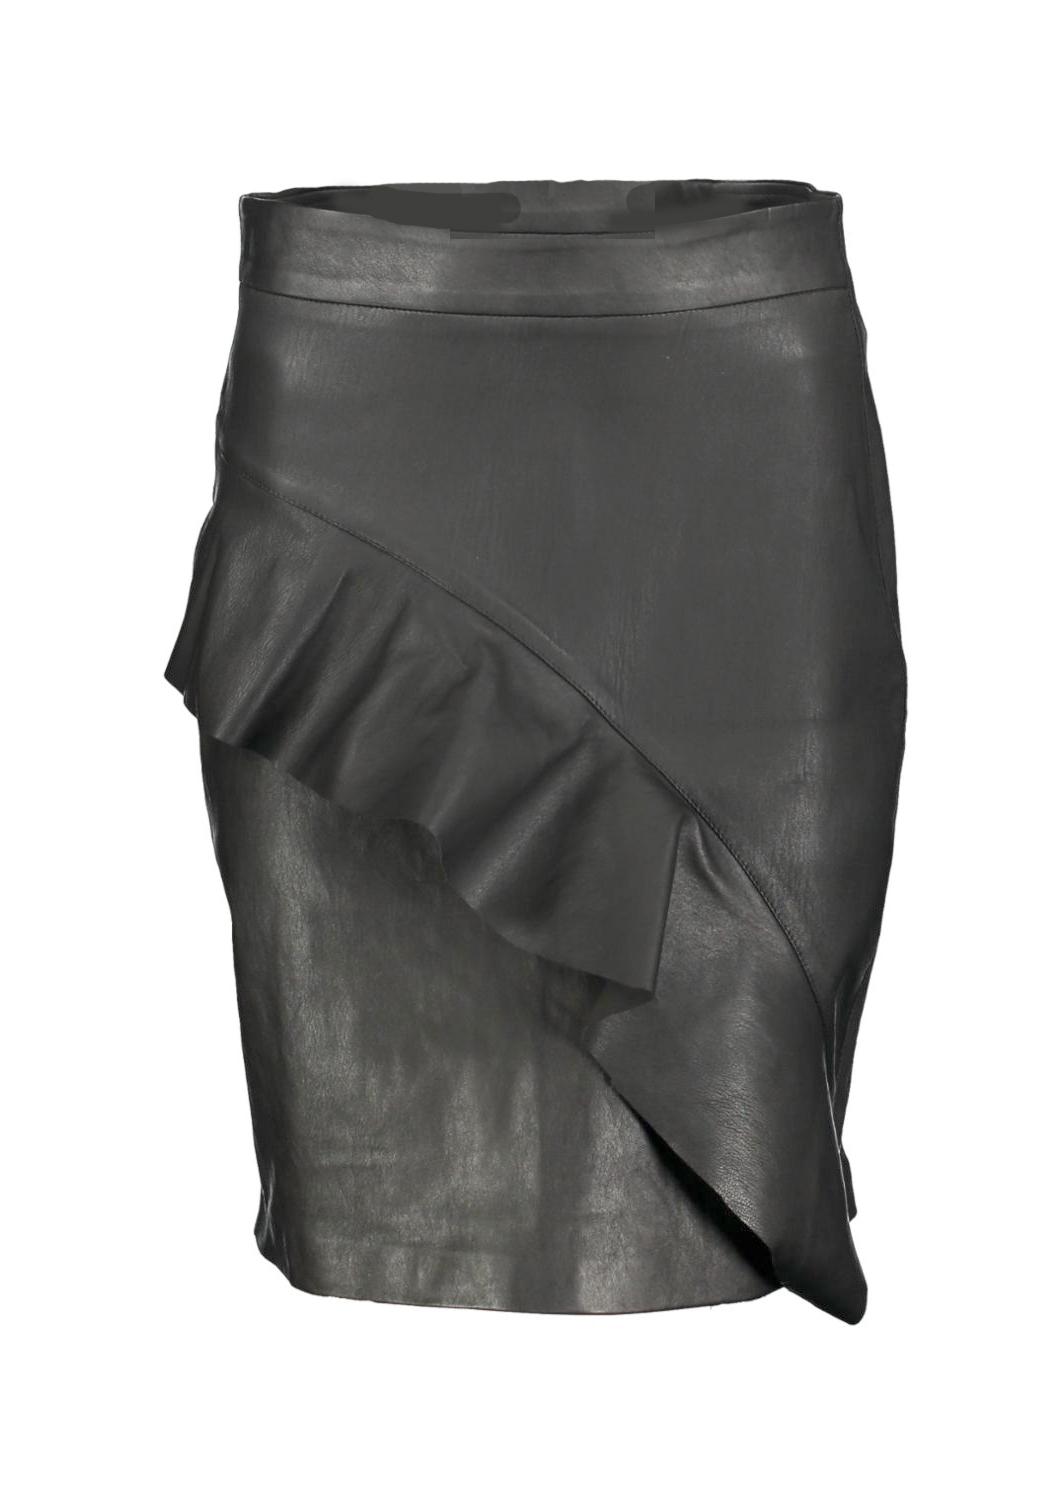 Paris skirt ruffle ED_Front+1_JPG-Fixed1200x1000